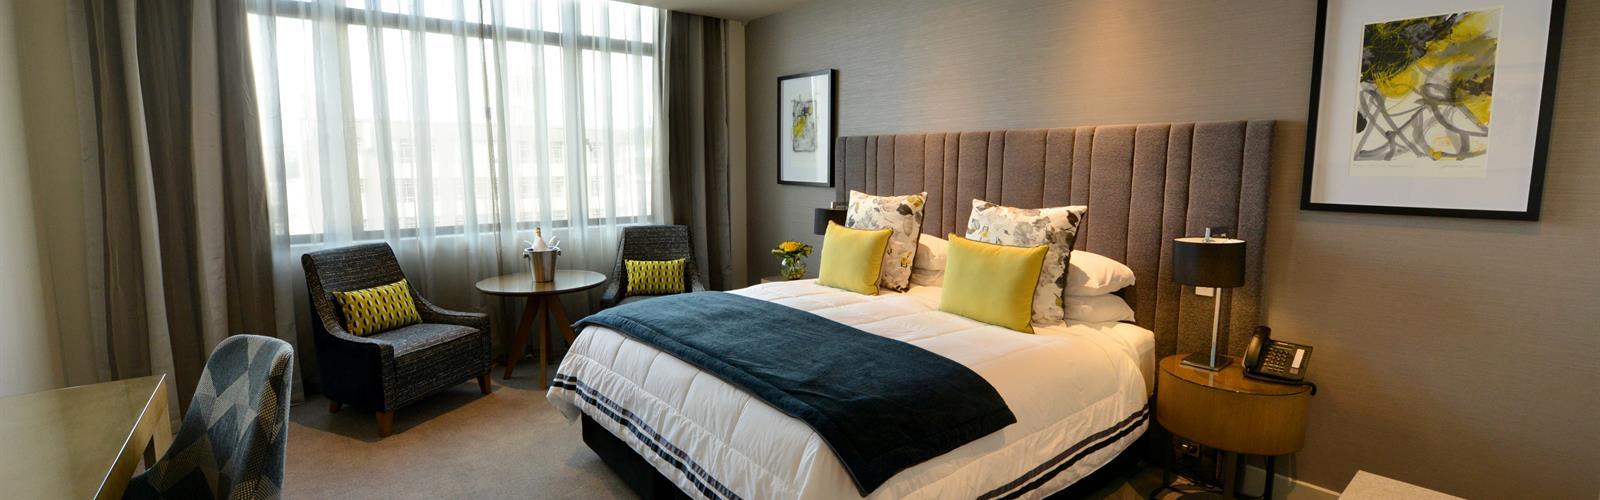 Distinction Dunedin double bedroom